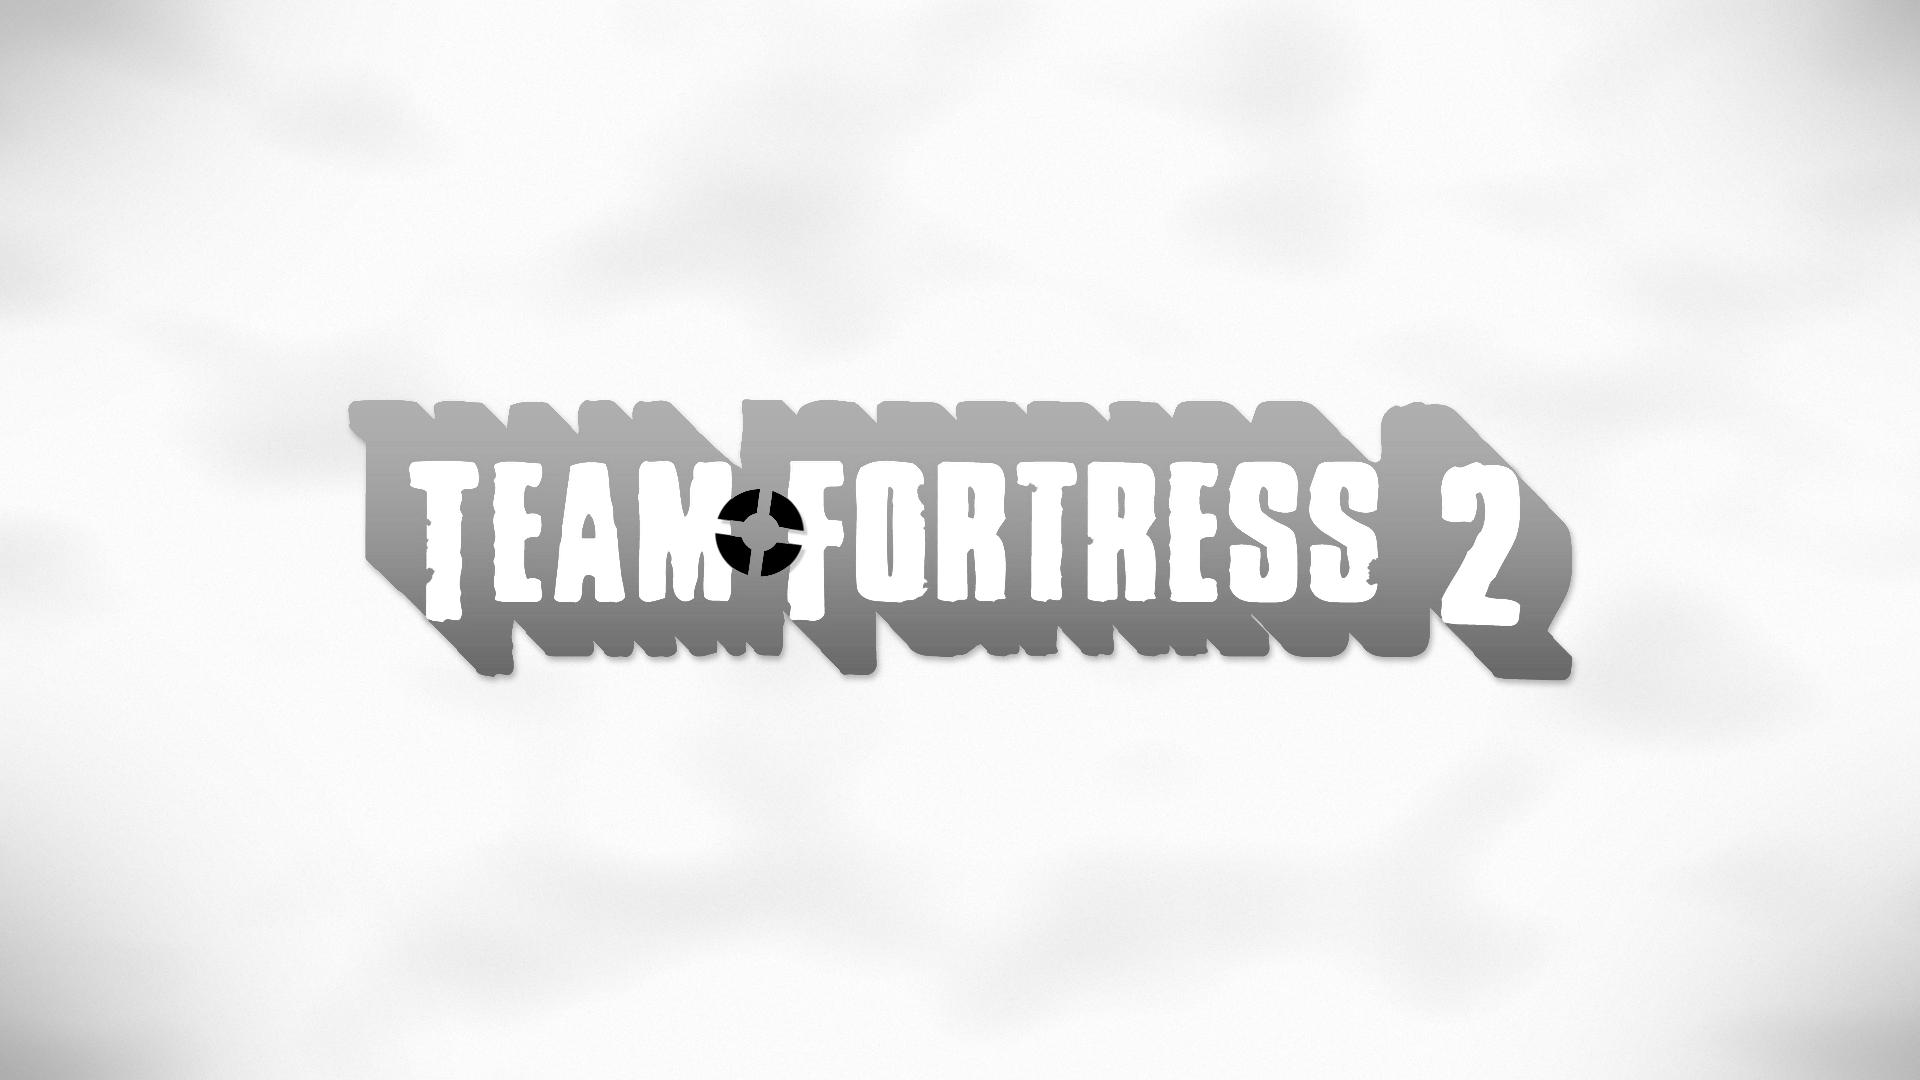 Team Fortress 2 Wallpaper By Xavur On Deviantart